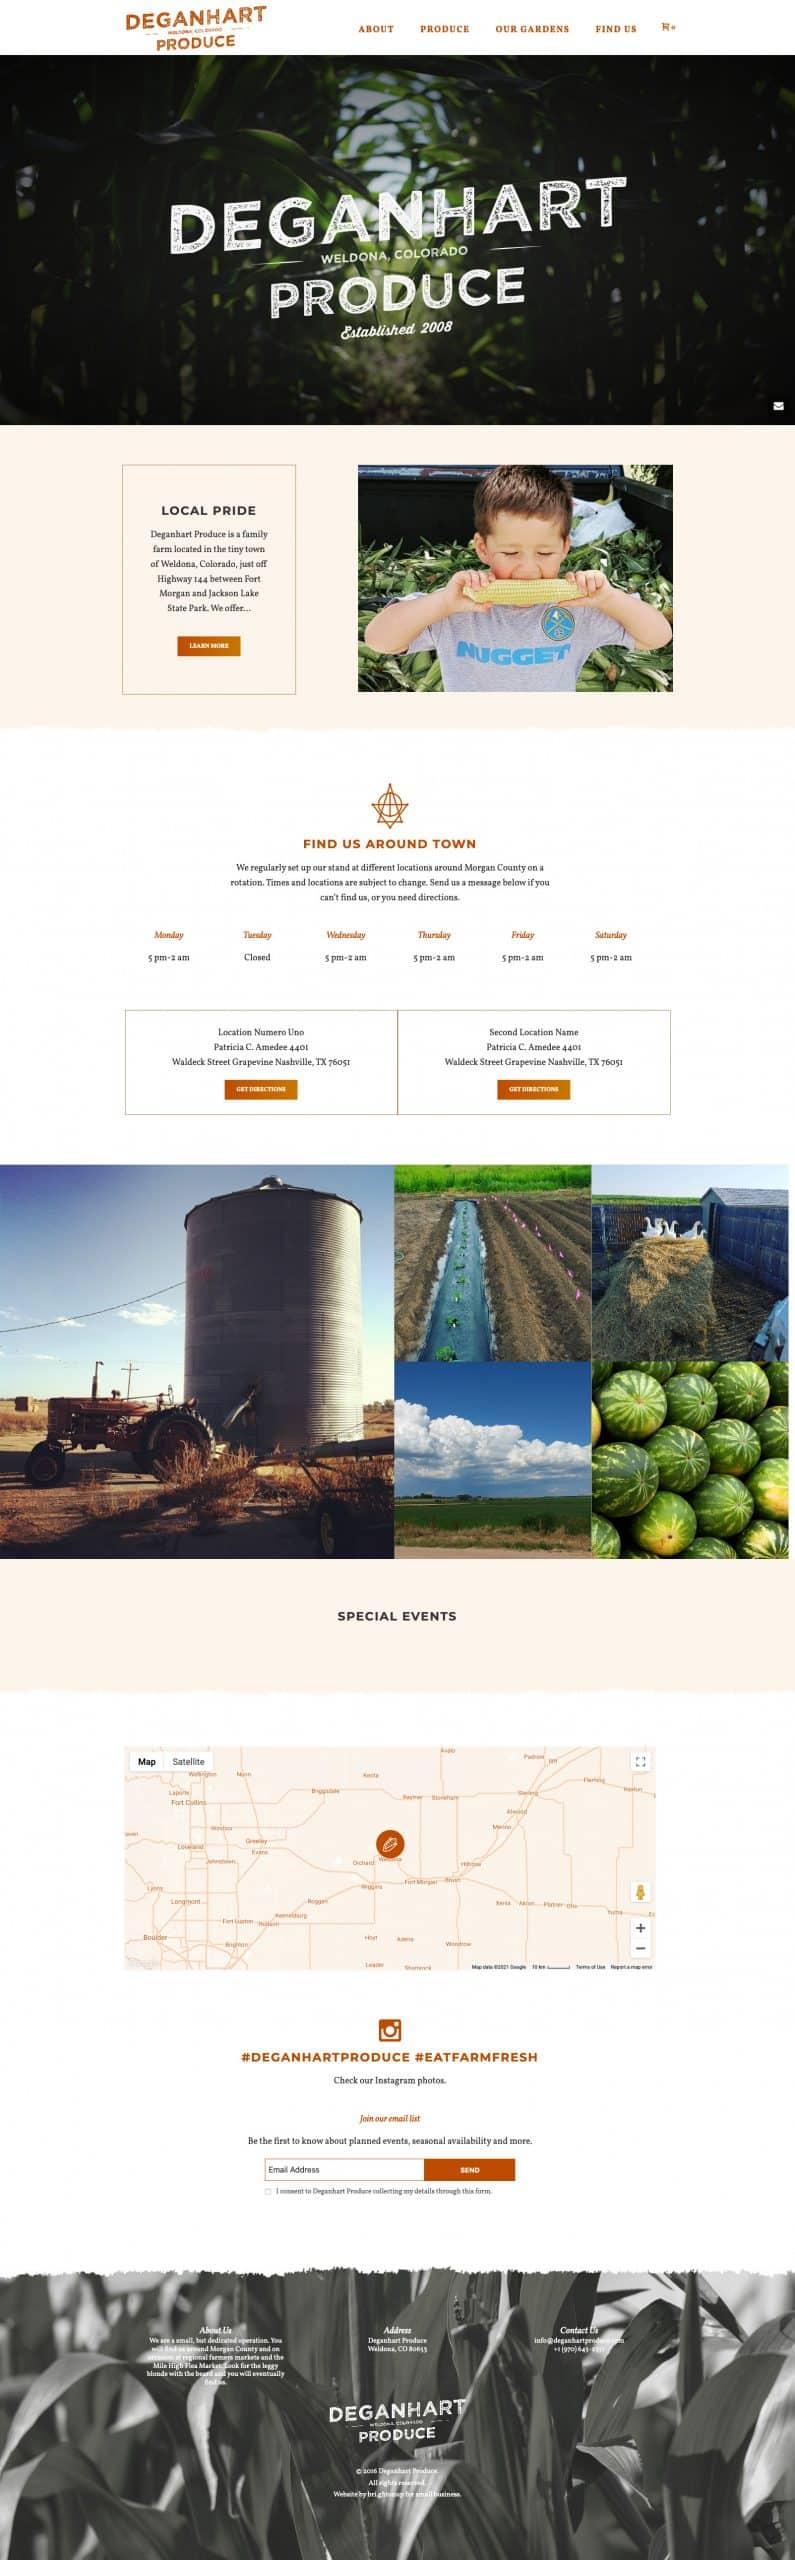 Screenshot_2021-01-12-Deganhart-Produce-–-Tasty-fruit-and-veggies-on-the-Colorado-Plains